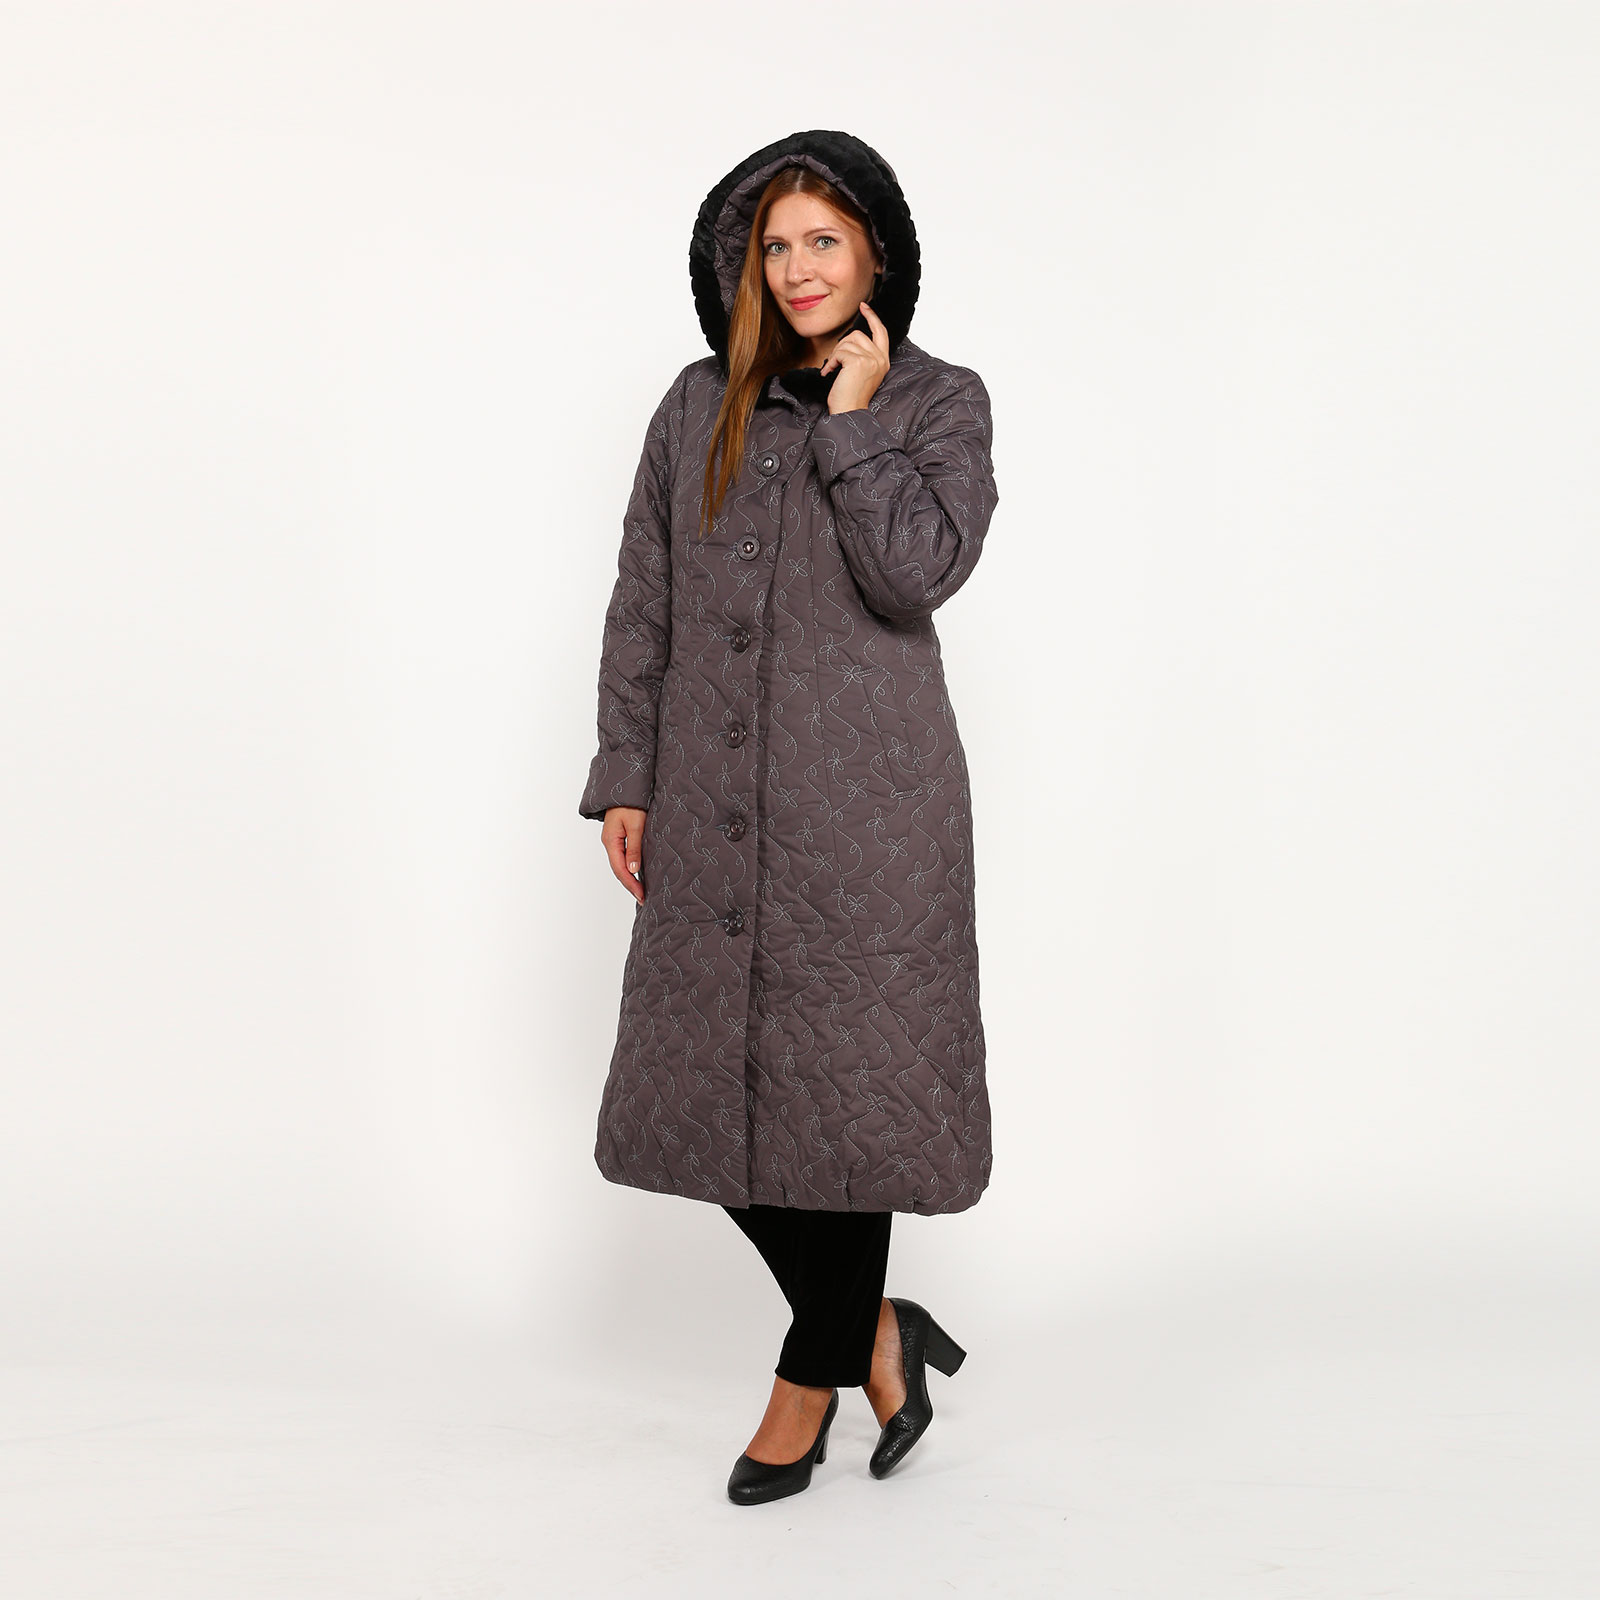 Пальто на пуговицах с вышивкой